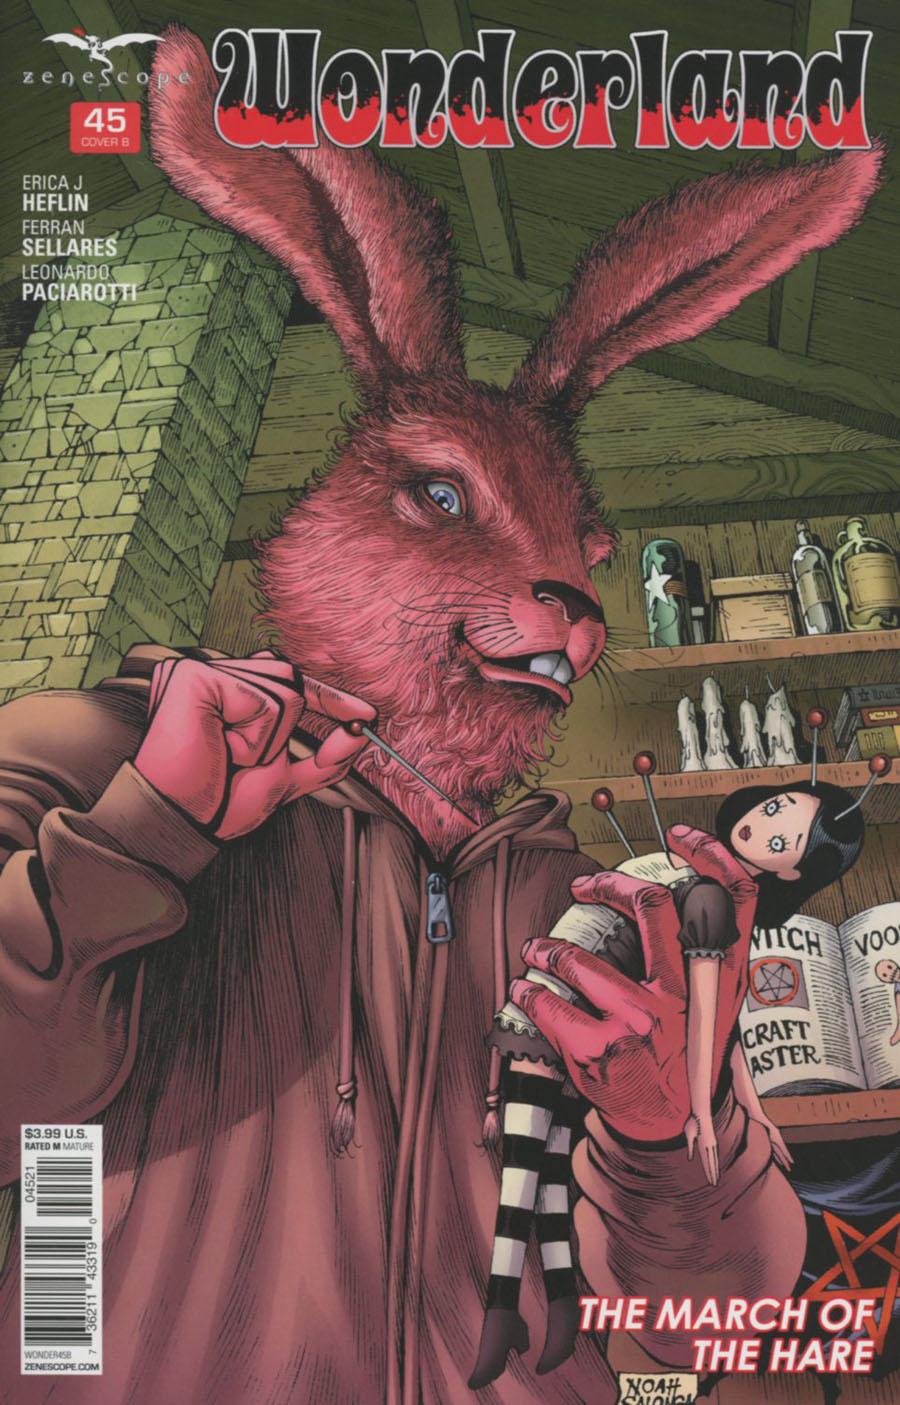 Grimm Fairy Tales Presents Wonderland Vol 2 #45 Cover B Noah Salonga